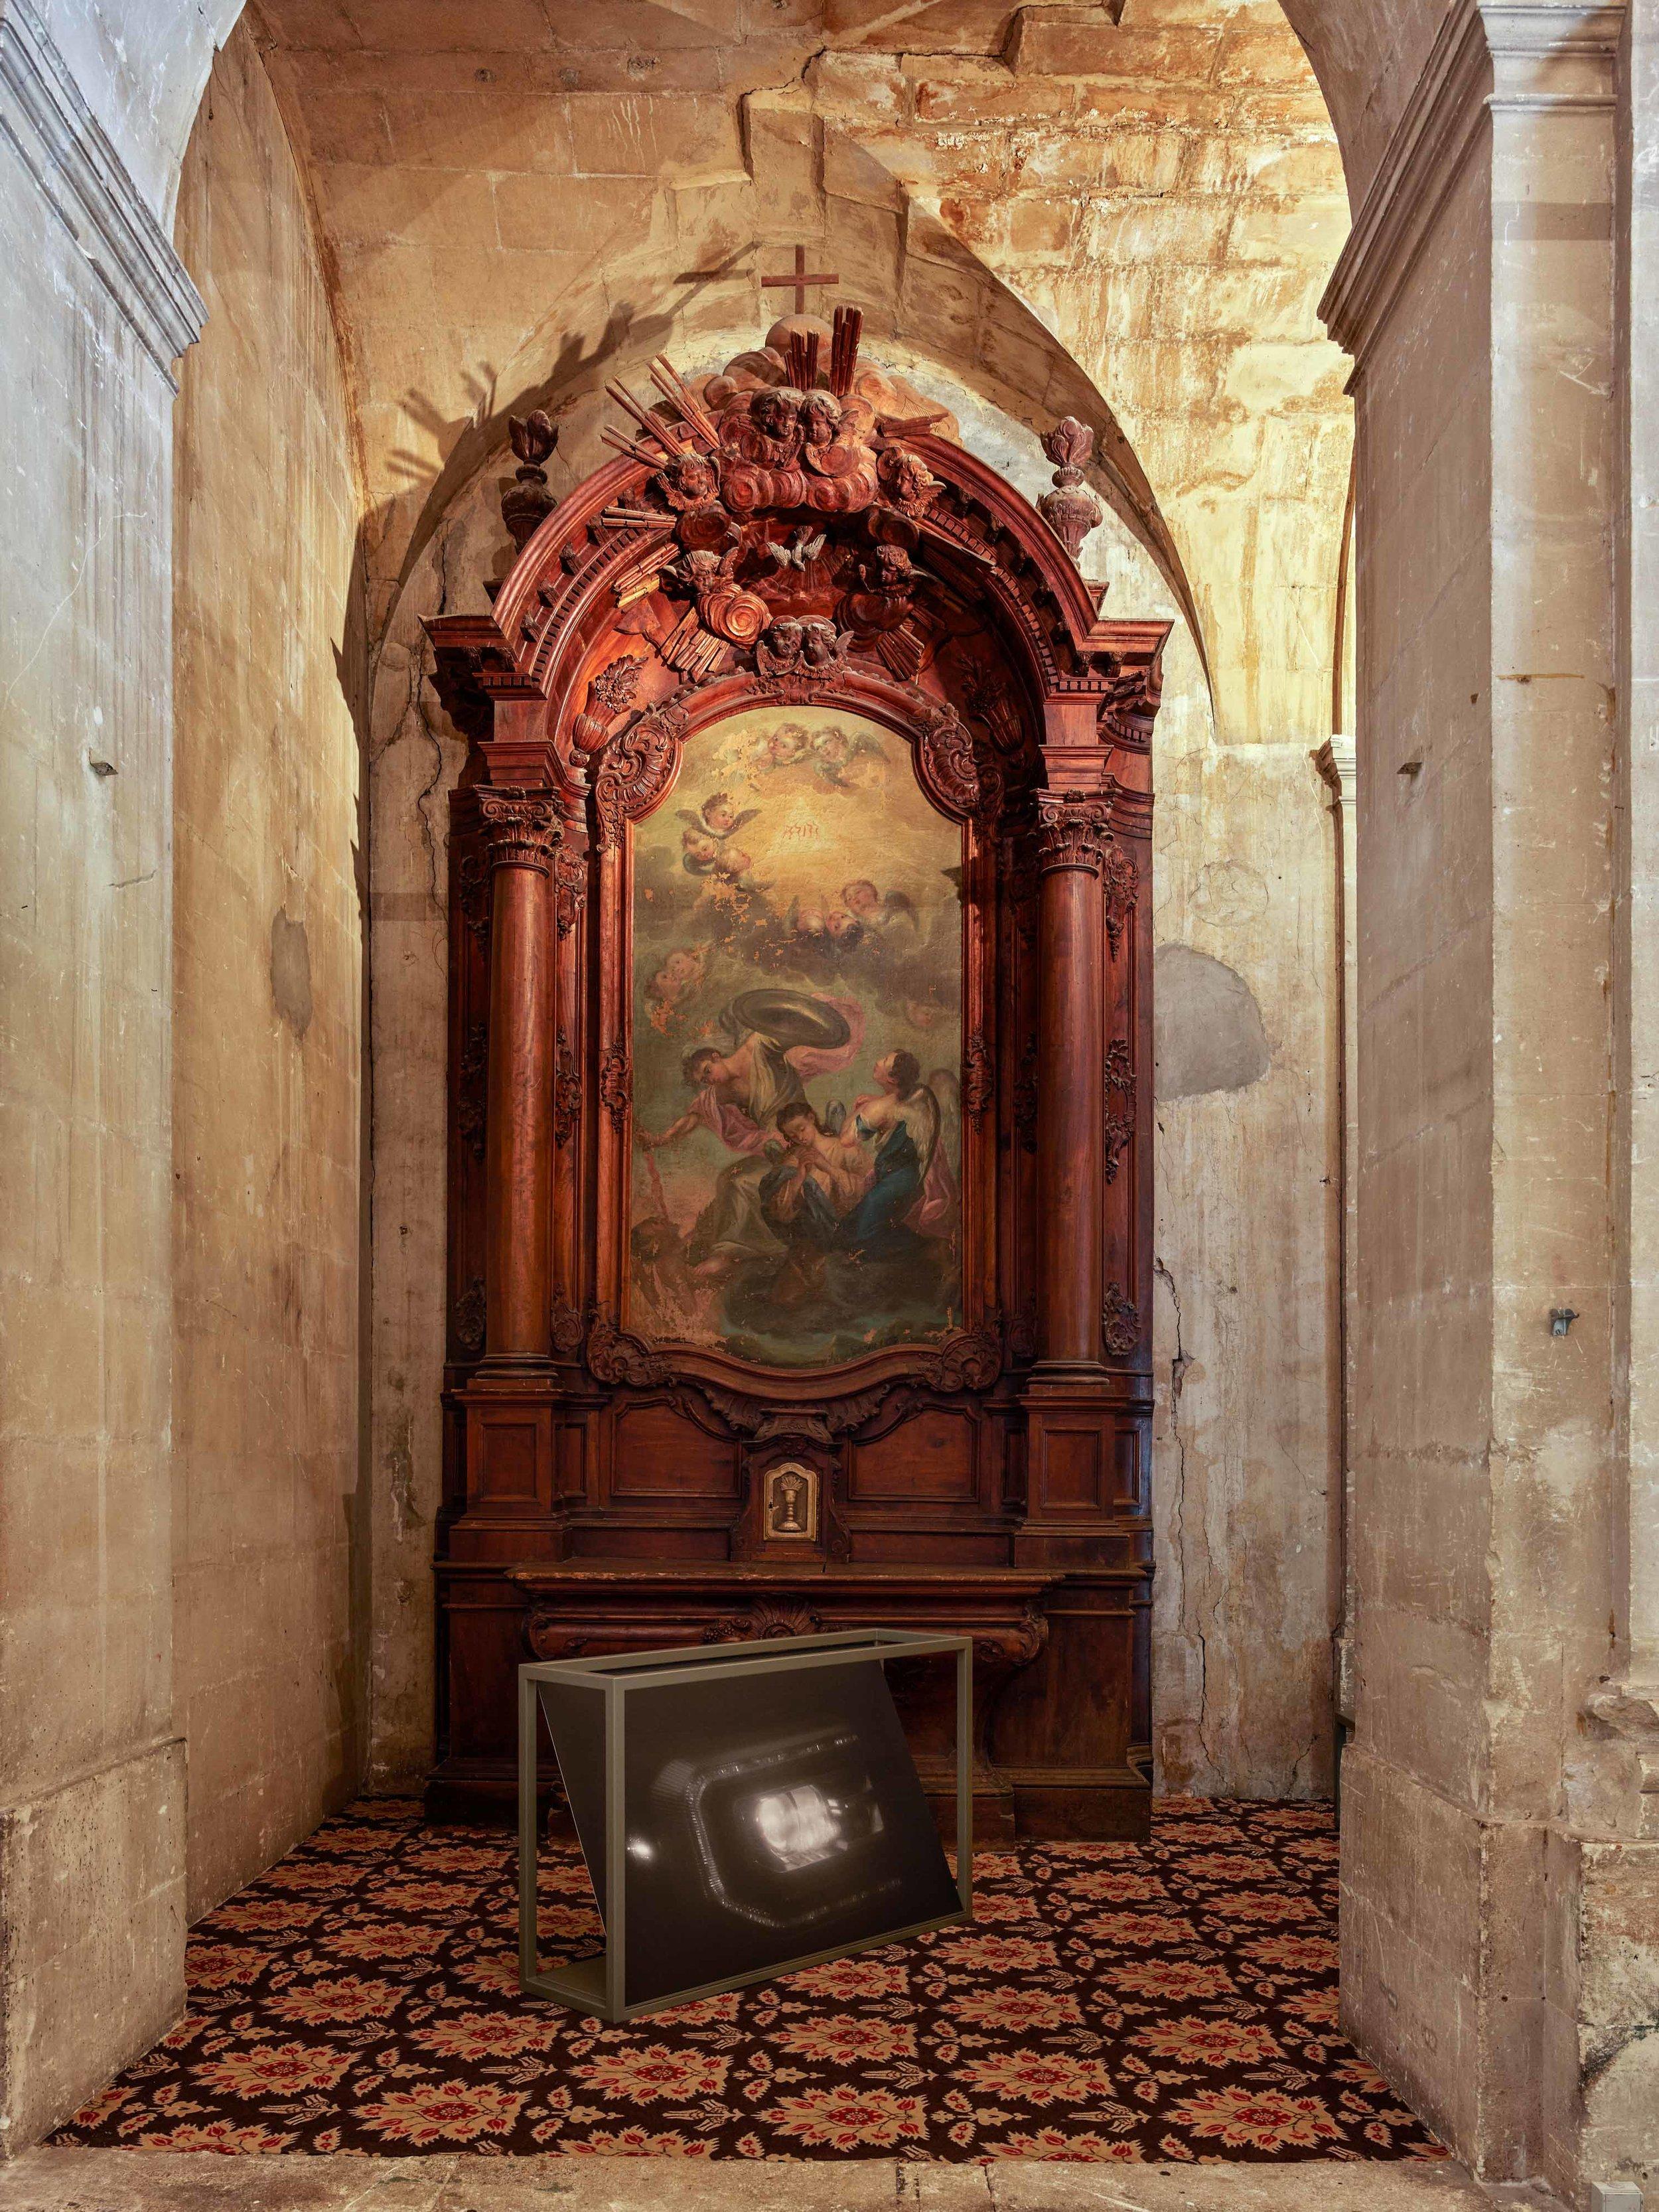 069Lët'z-Arles.jpg